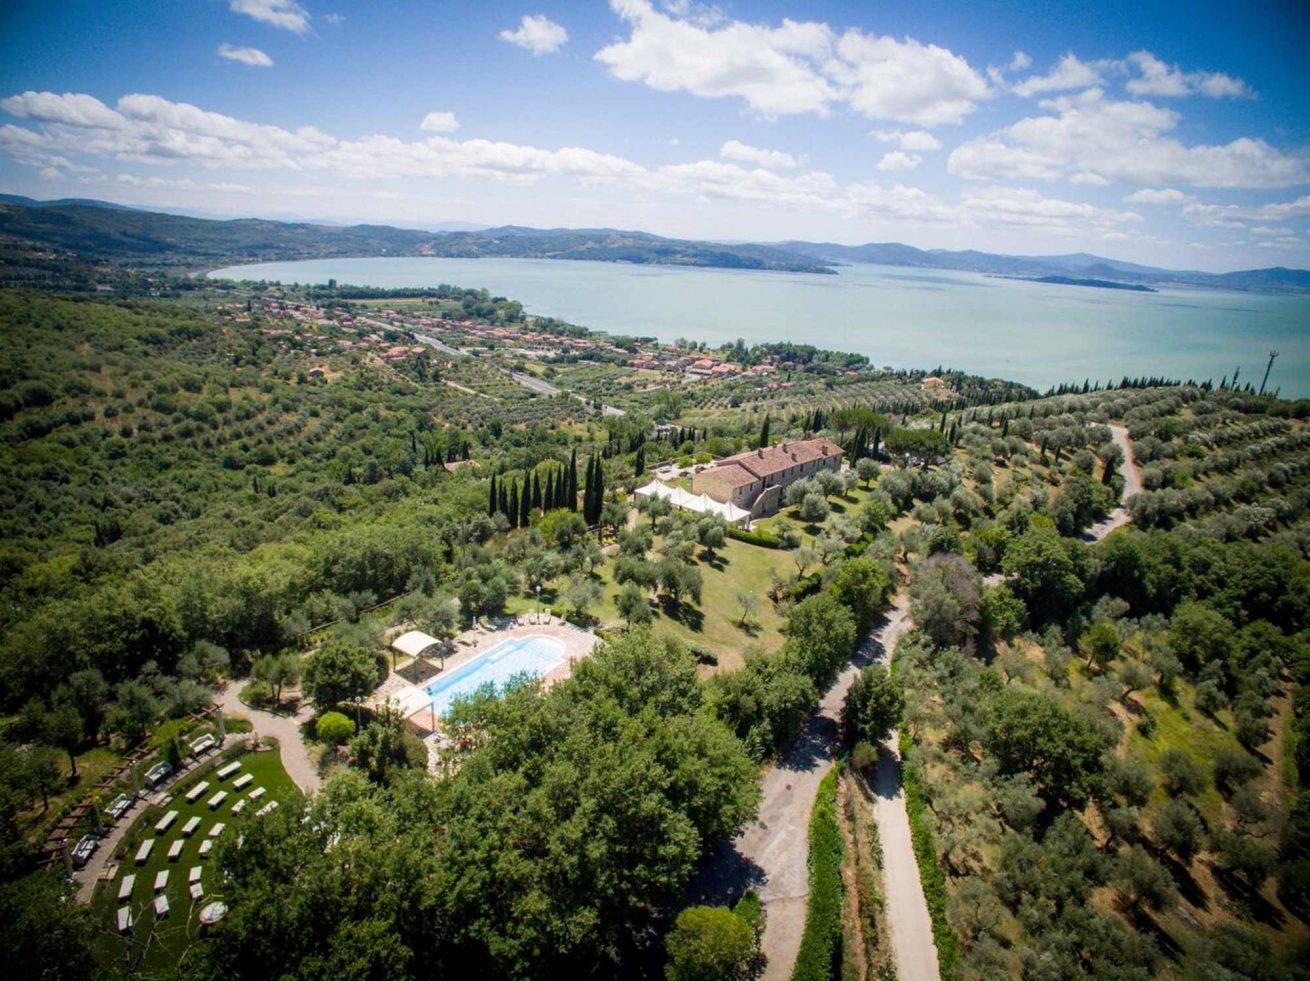 Amazing View of the pool area at Villa San Crispolto